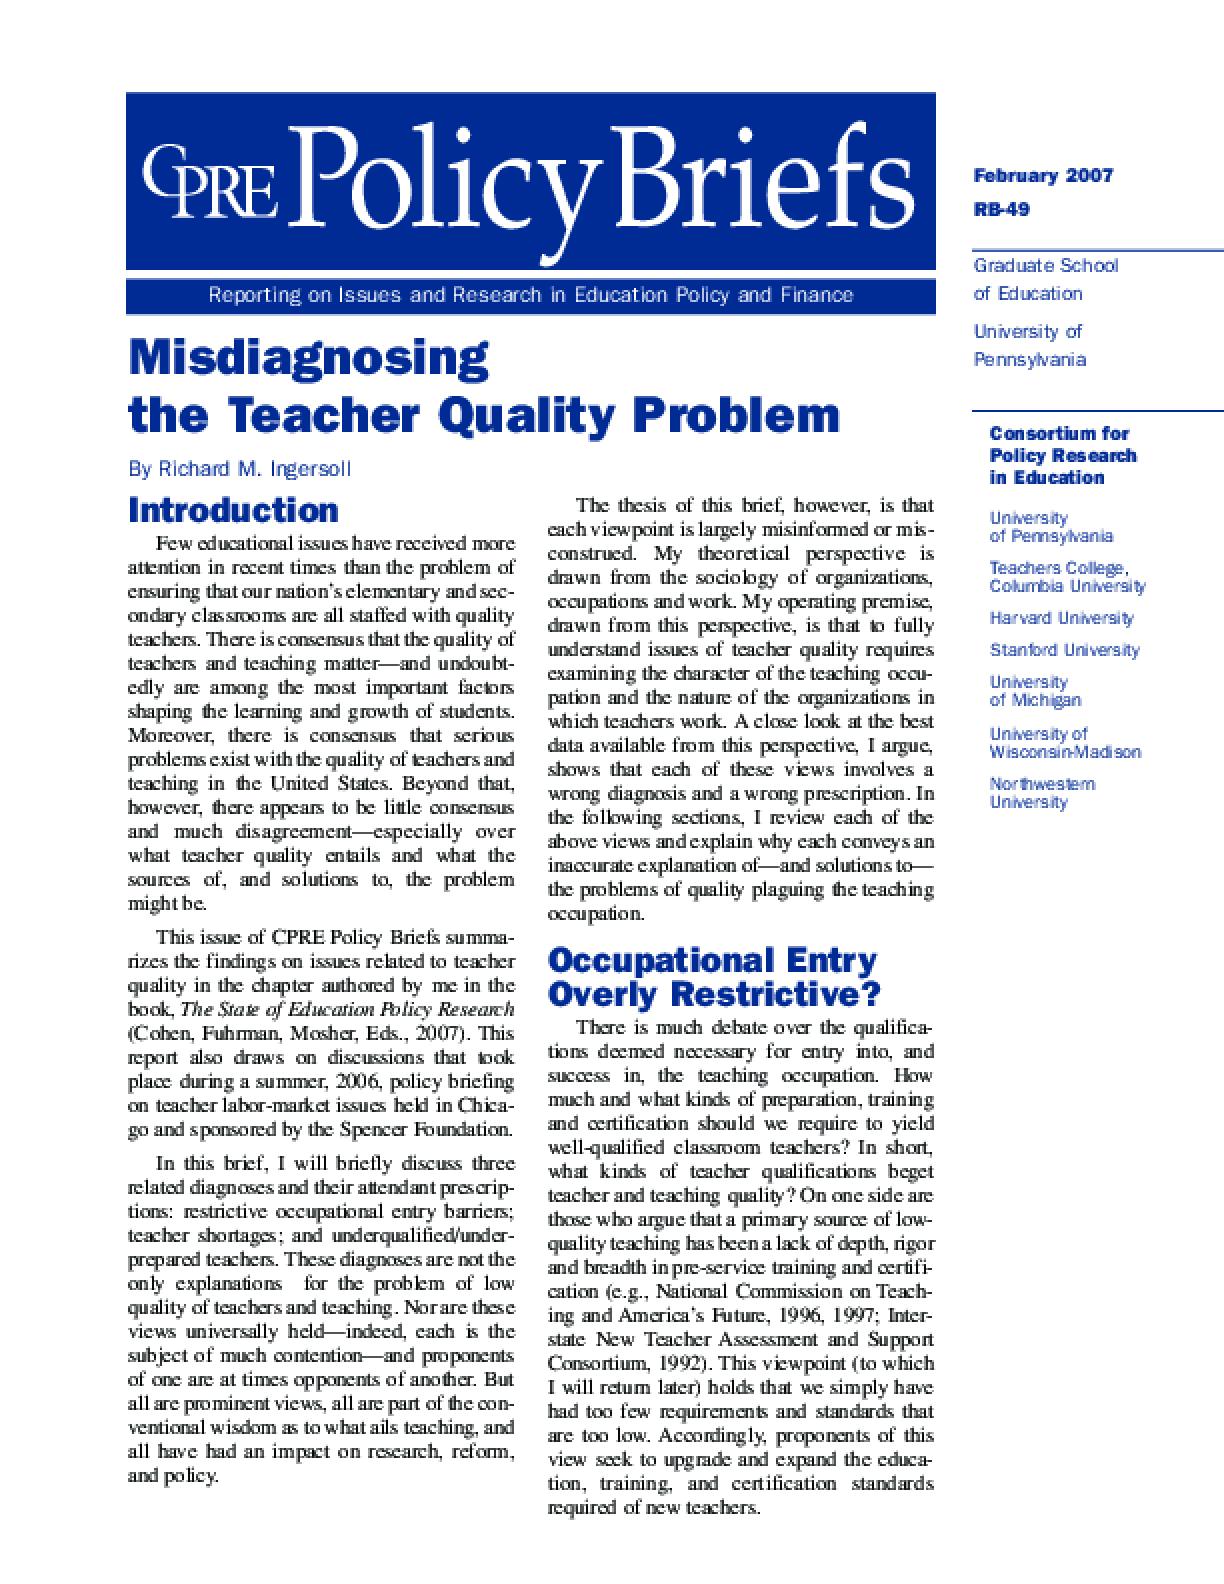 Misdiagnosing the Teacher Quality Problem